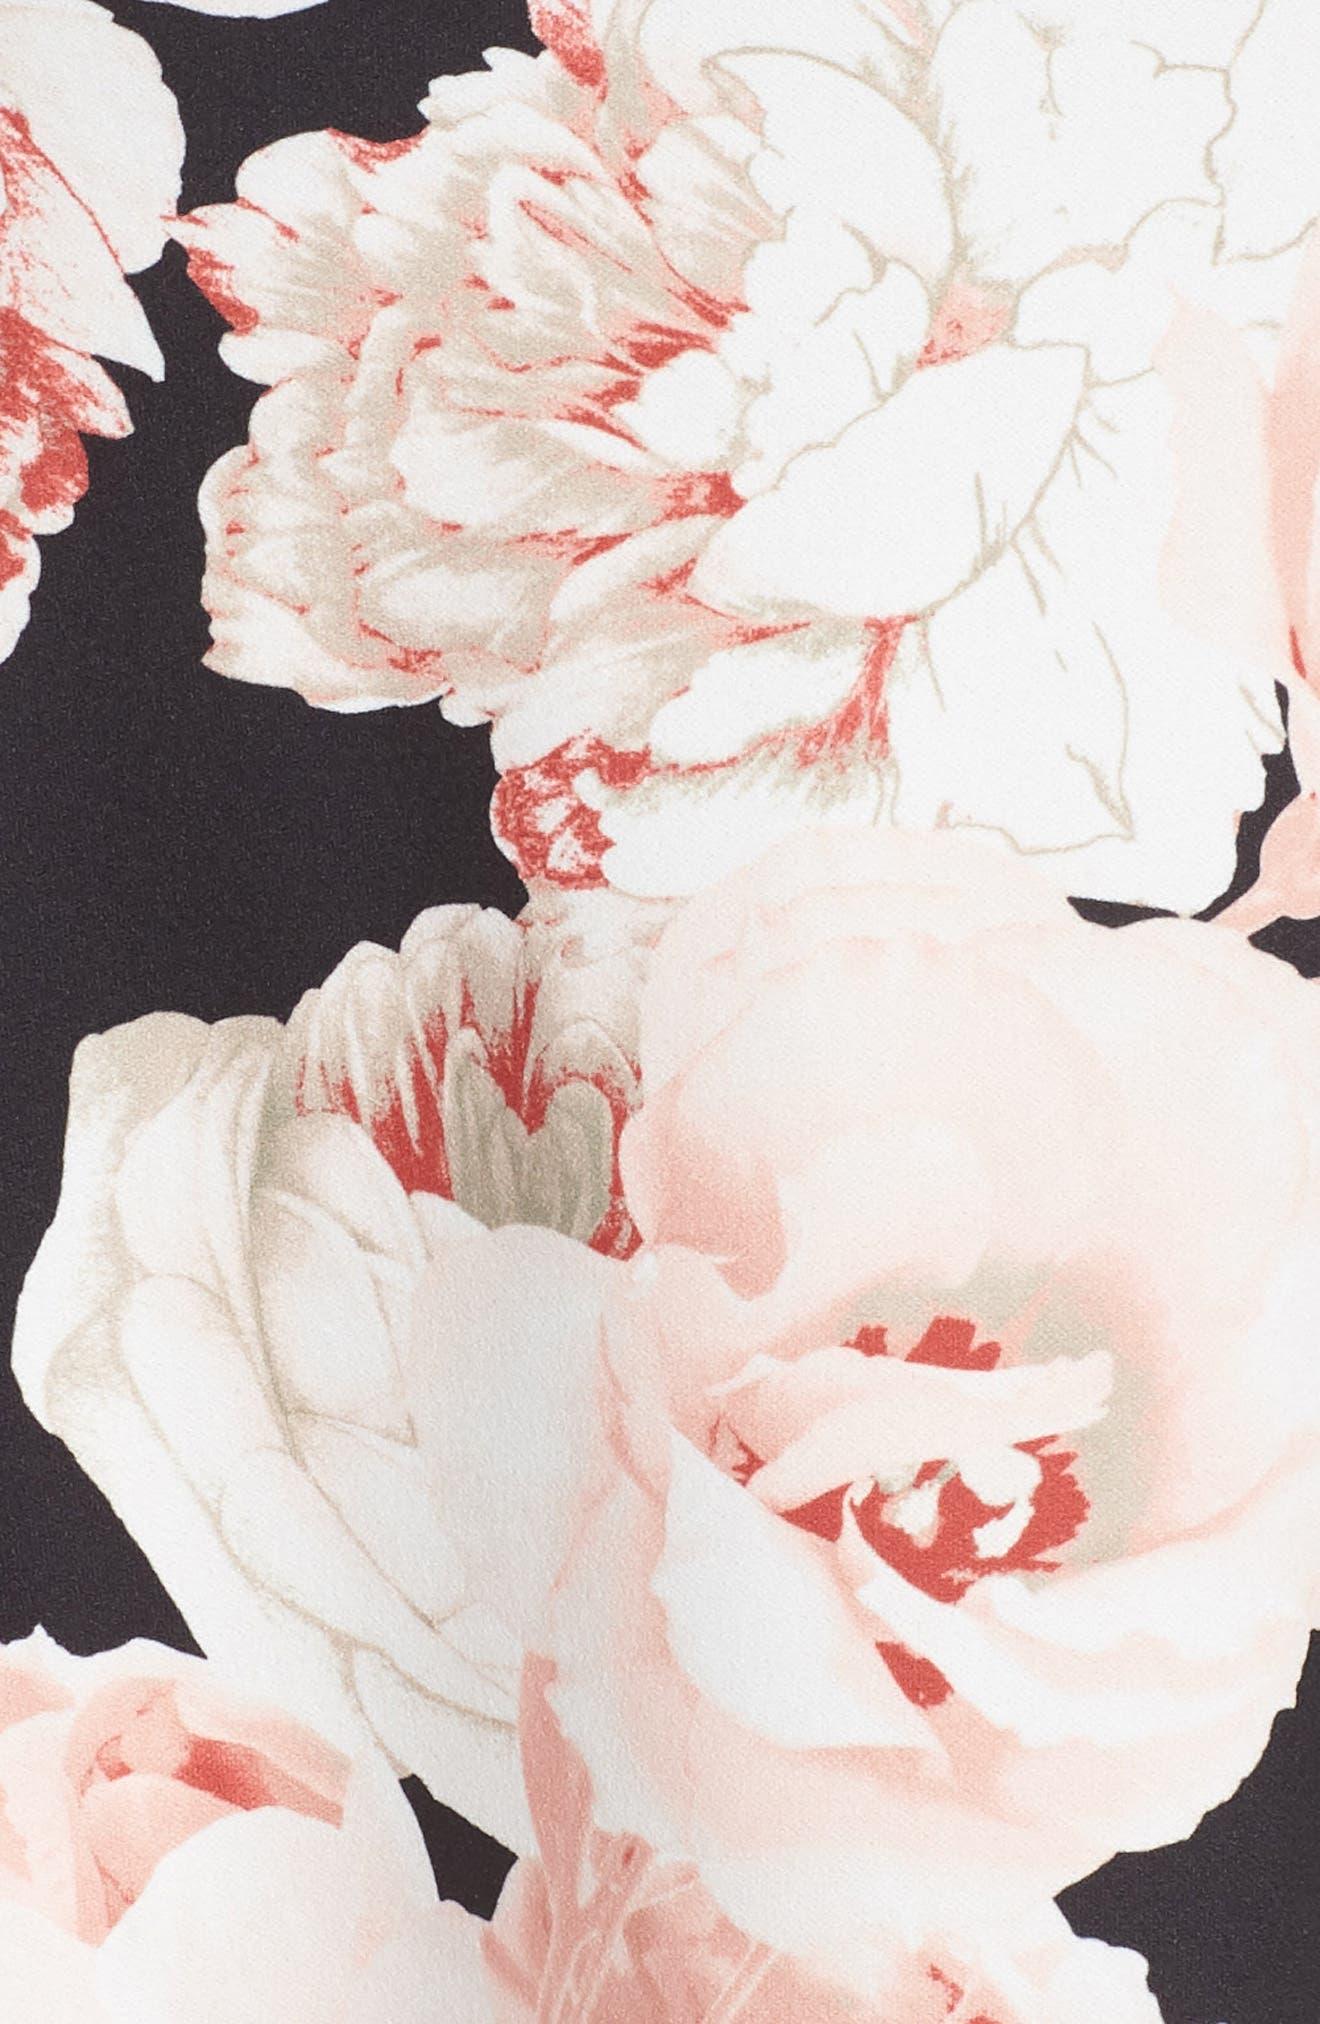 Floral A-Line Dress,                             Alternate thumbnail 5, color,                             Pink/ Black Multi